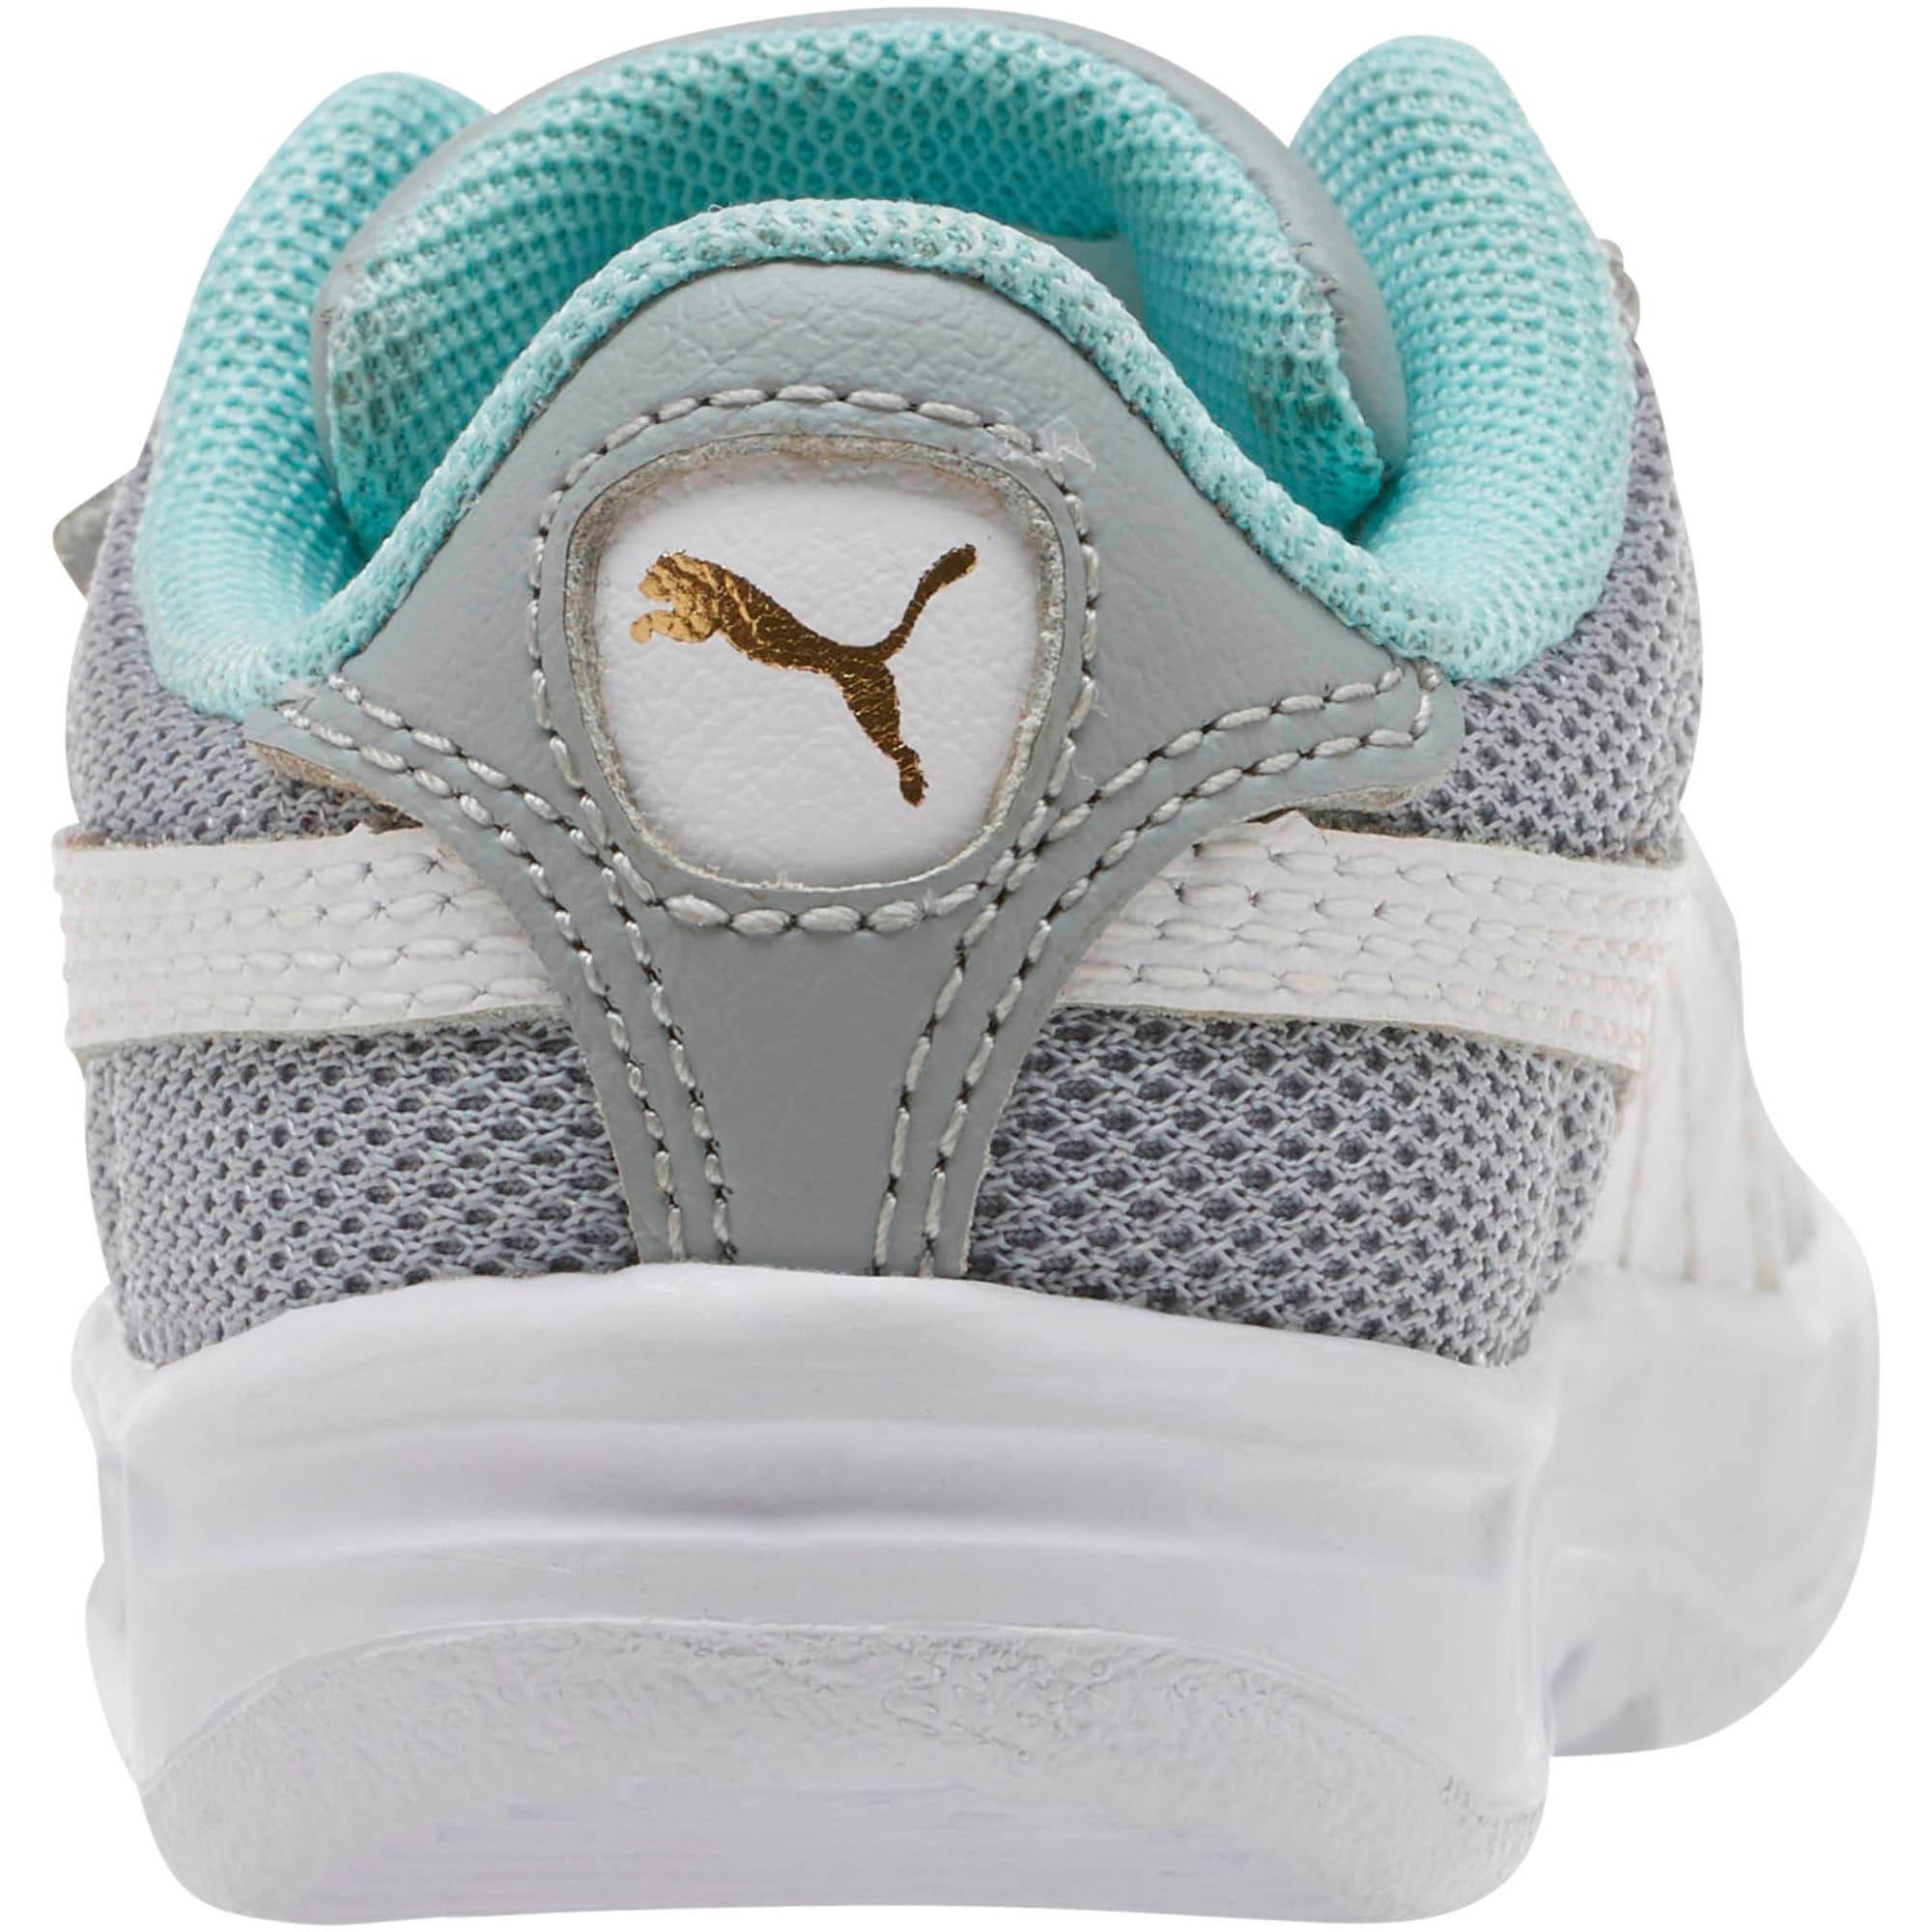 Thumbnail 4 of California Casual Toddler Shoes, Quarry-Puma White-Gold, medium